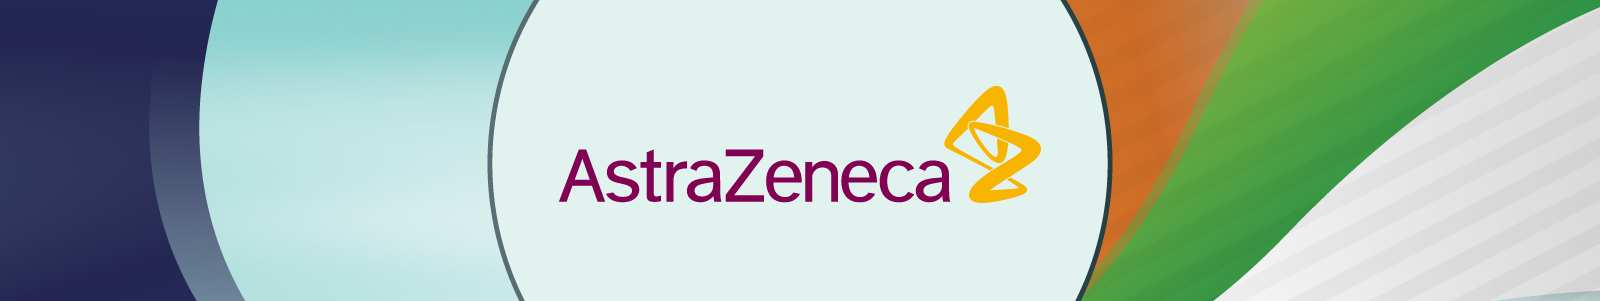 ETED2021-banner-astrazeneca